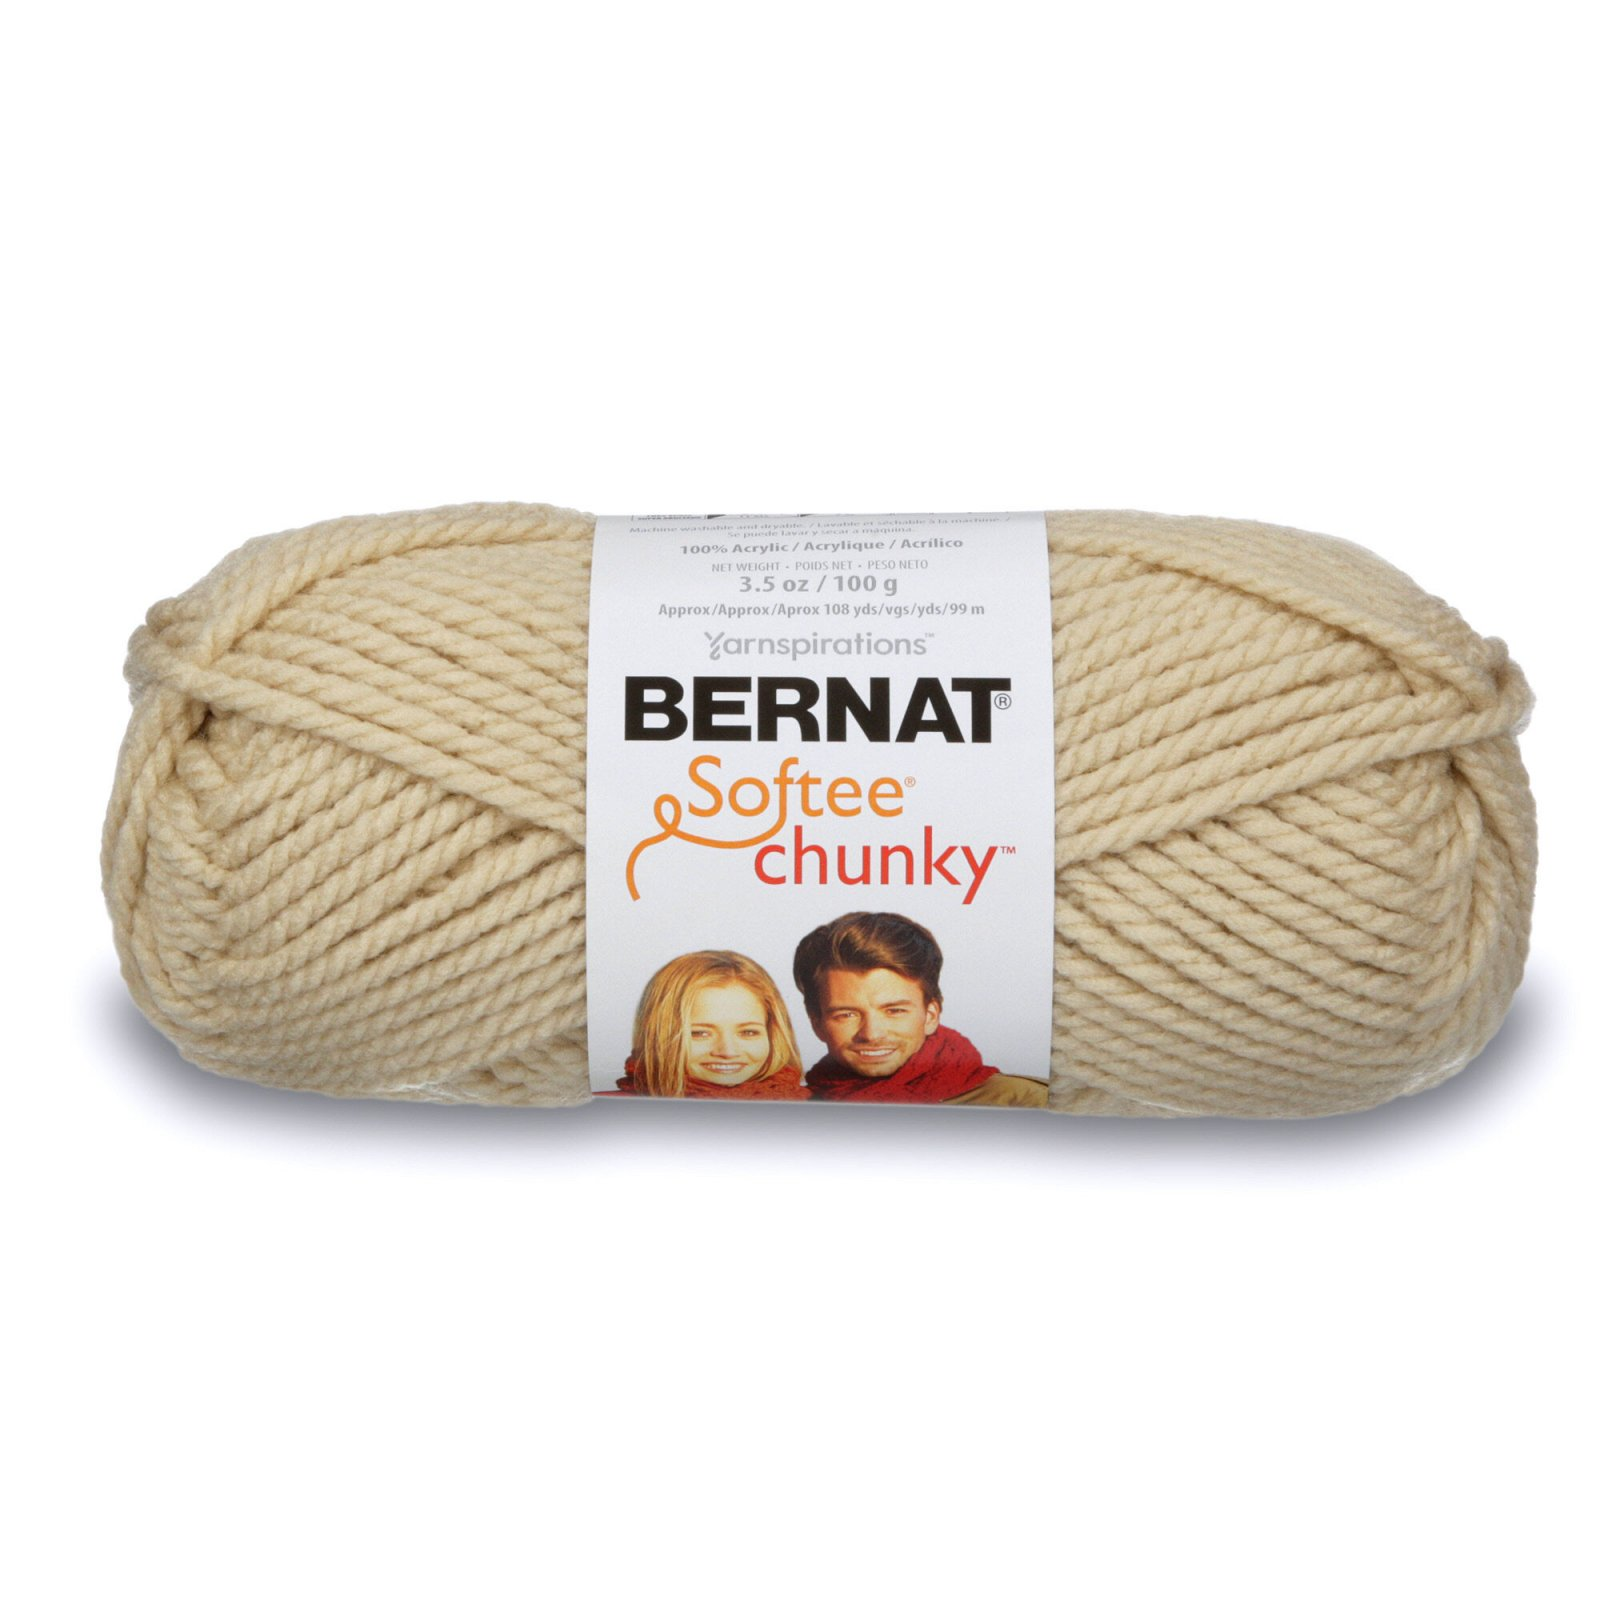 Bernat Softee Chunky - Assorted Colours